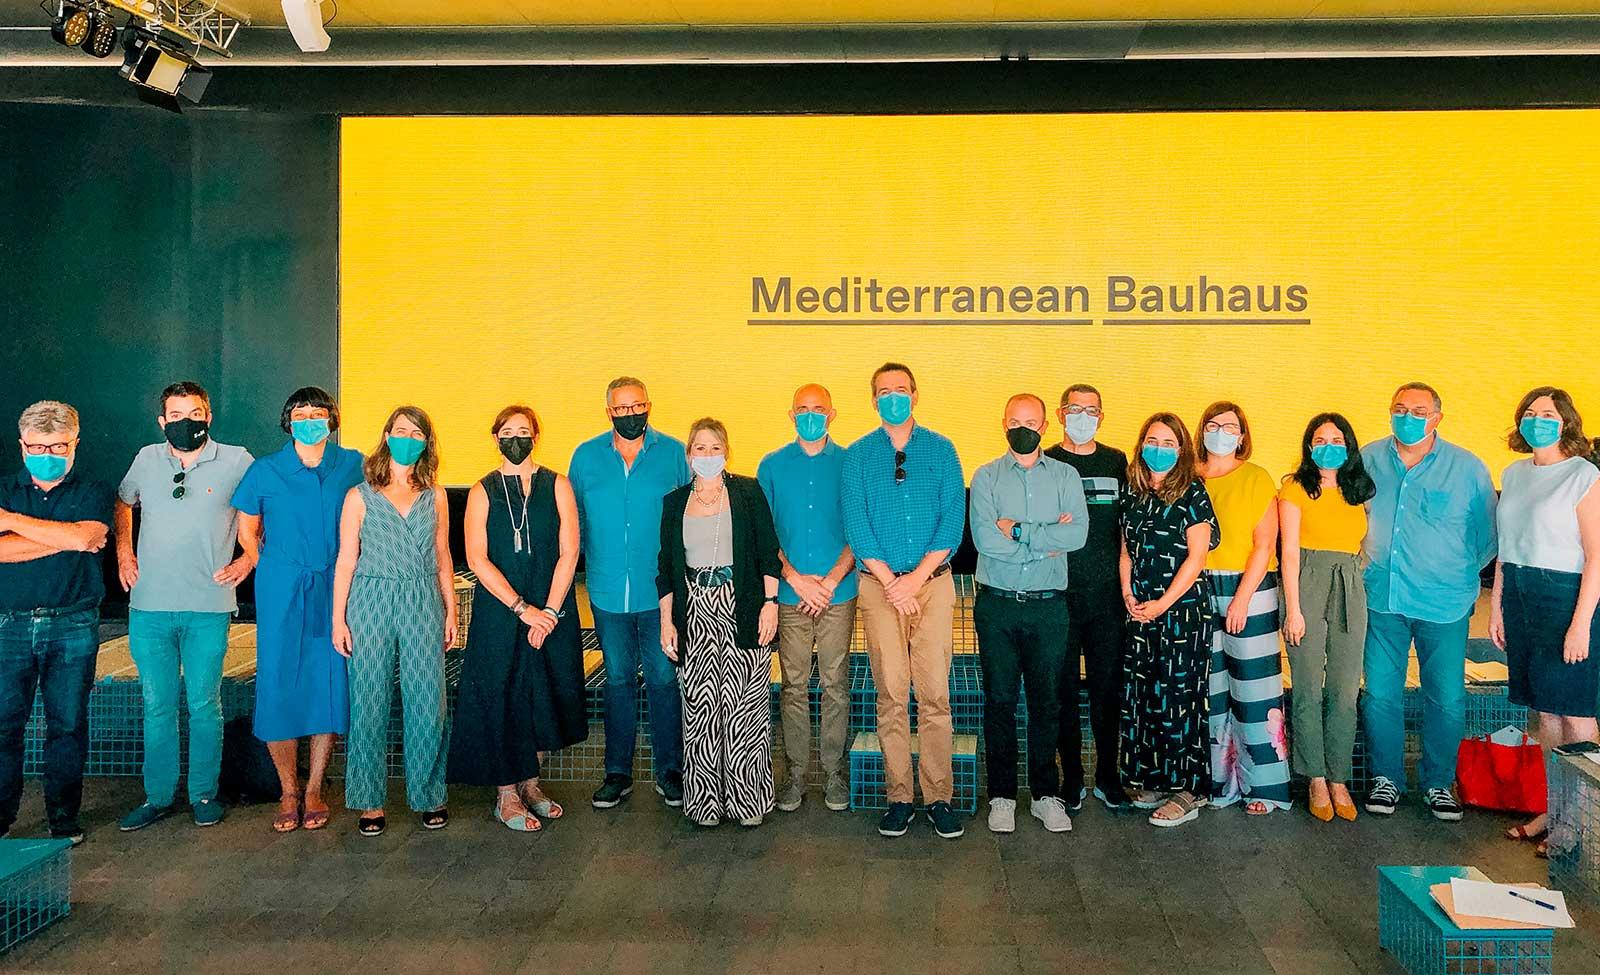 New-European-Bauhaus-Mediterranea-14-peque